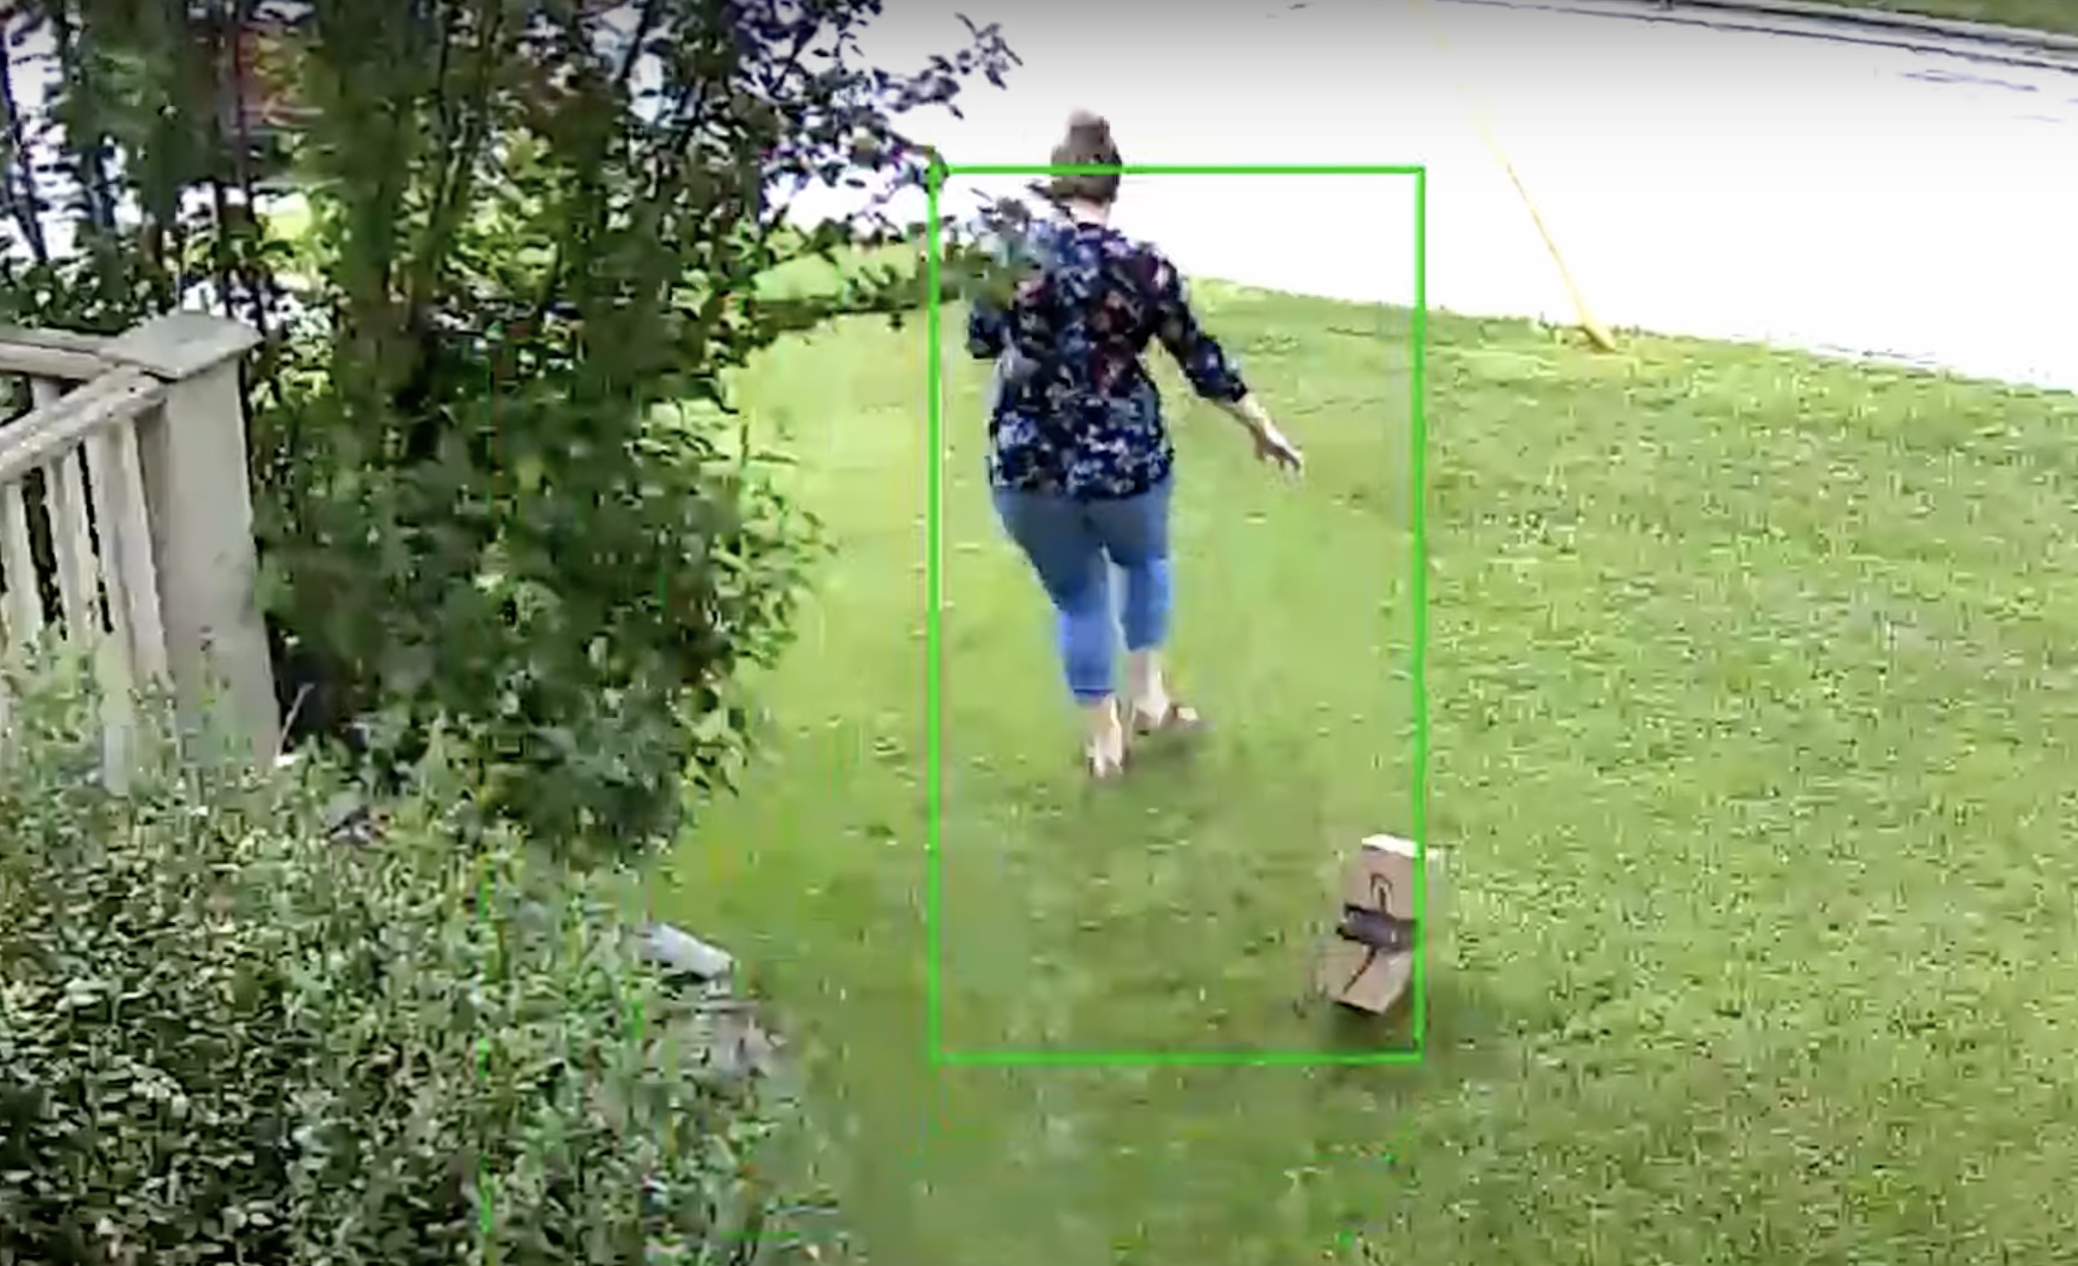 package thief running away